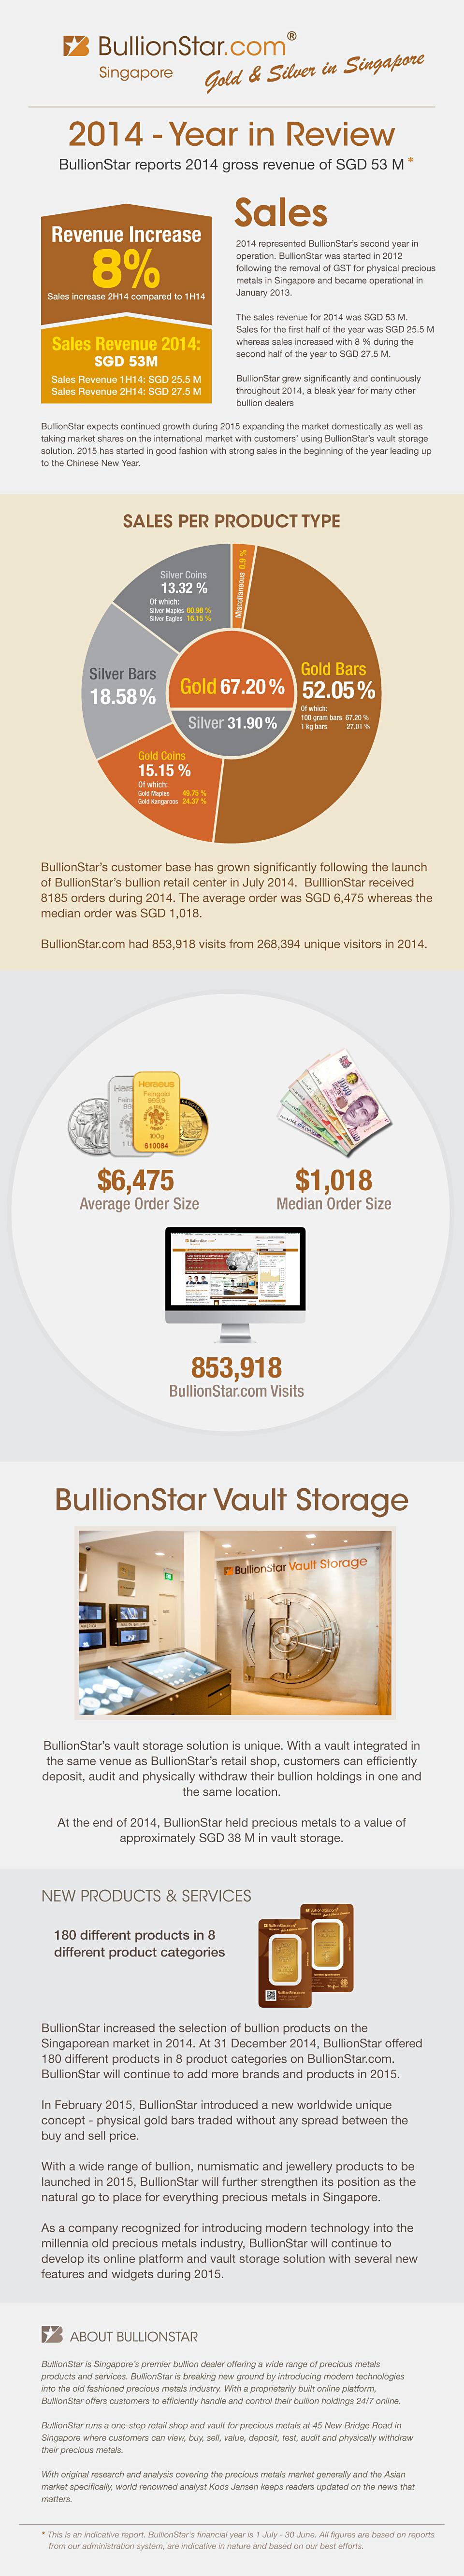 BullionStar Financials 2014 - Year in Review